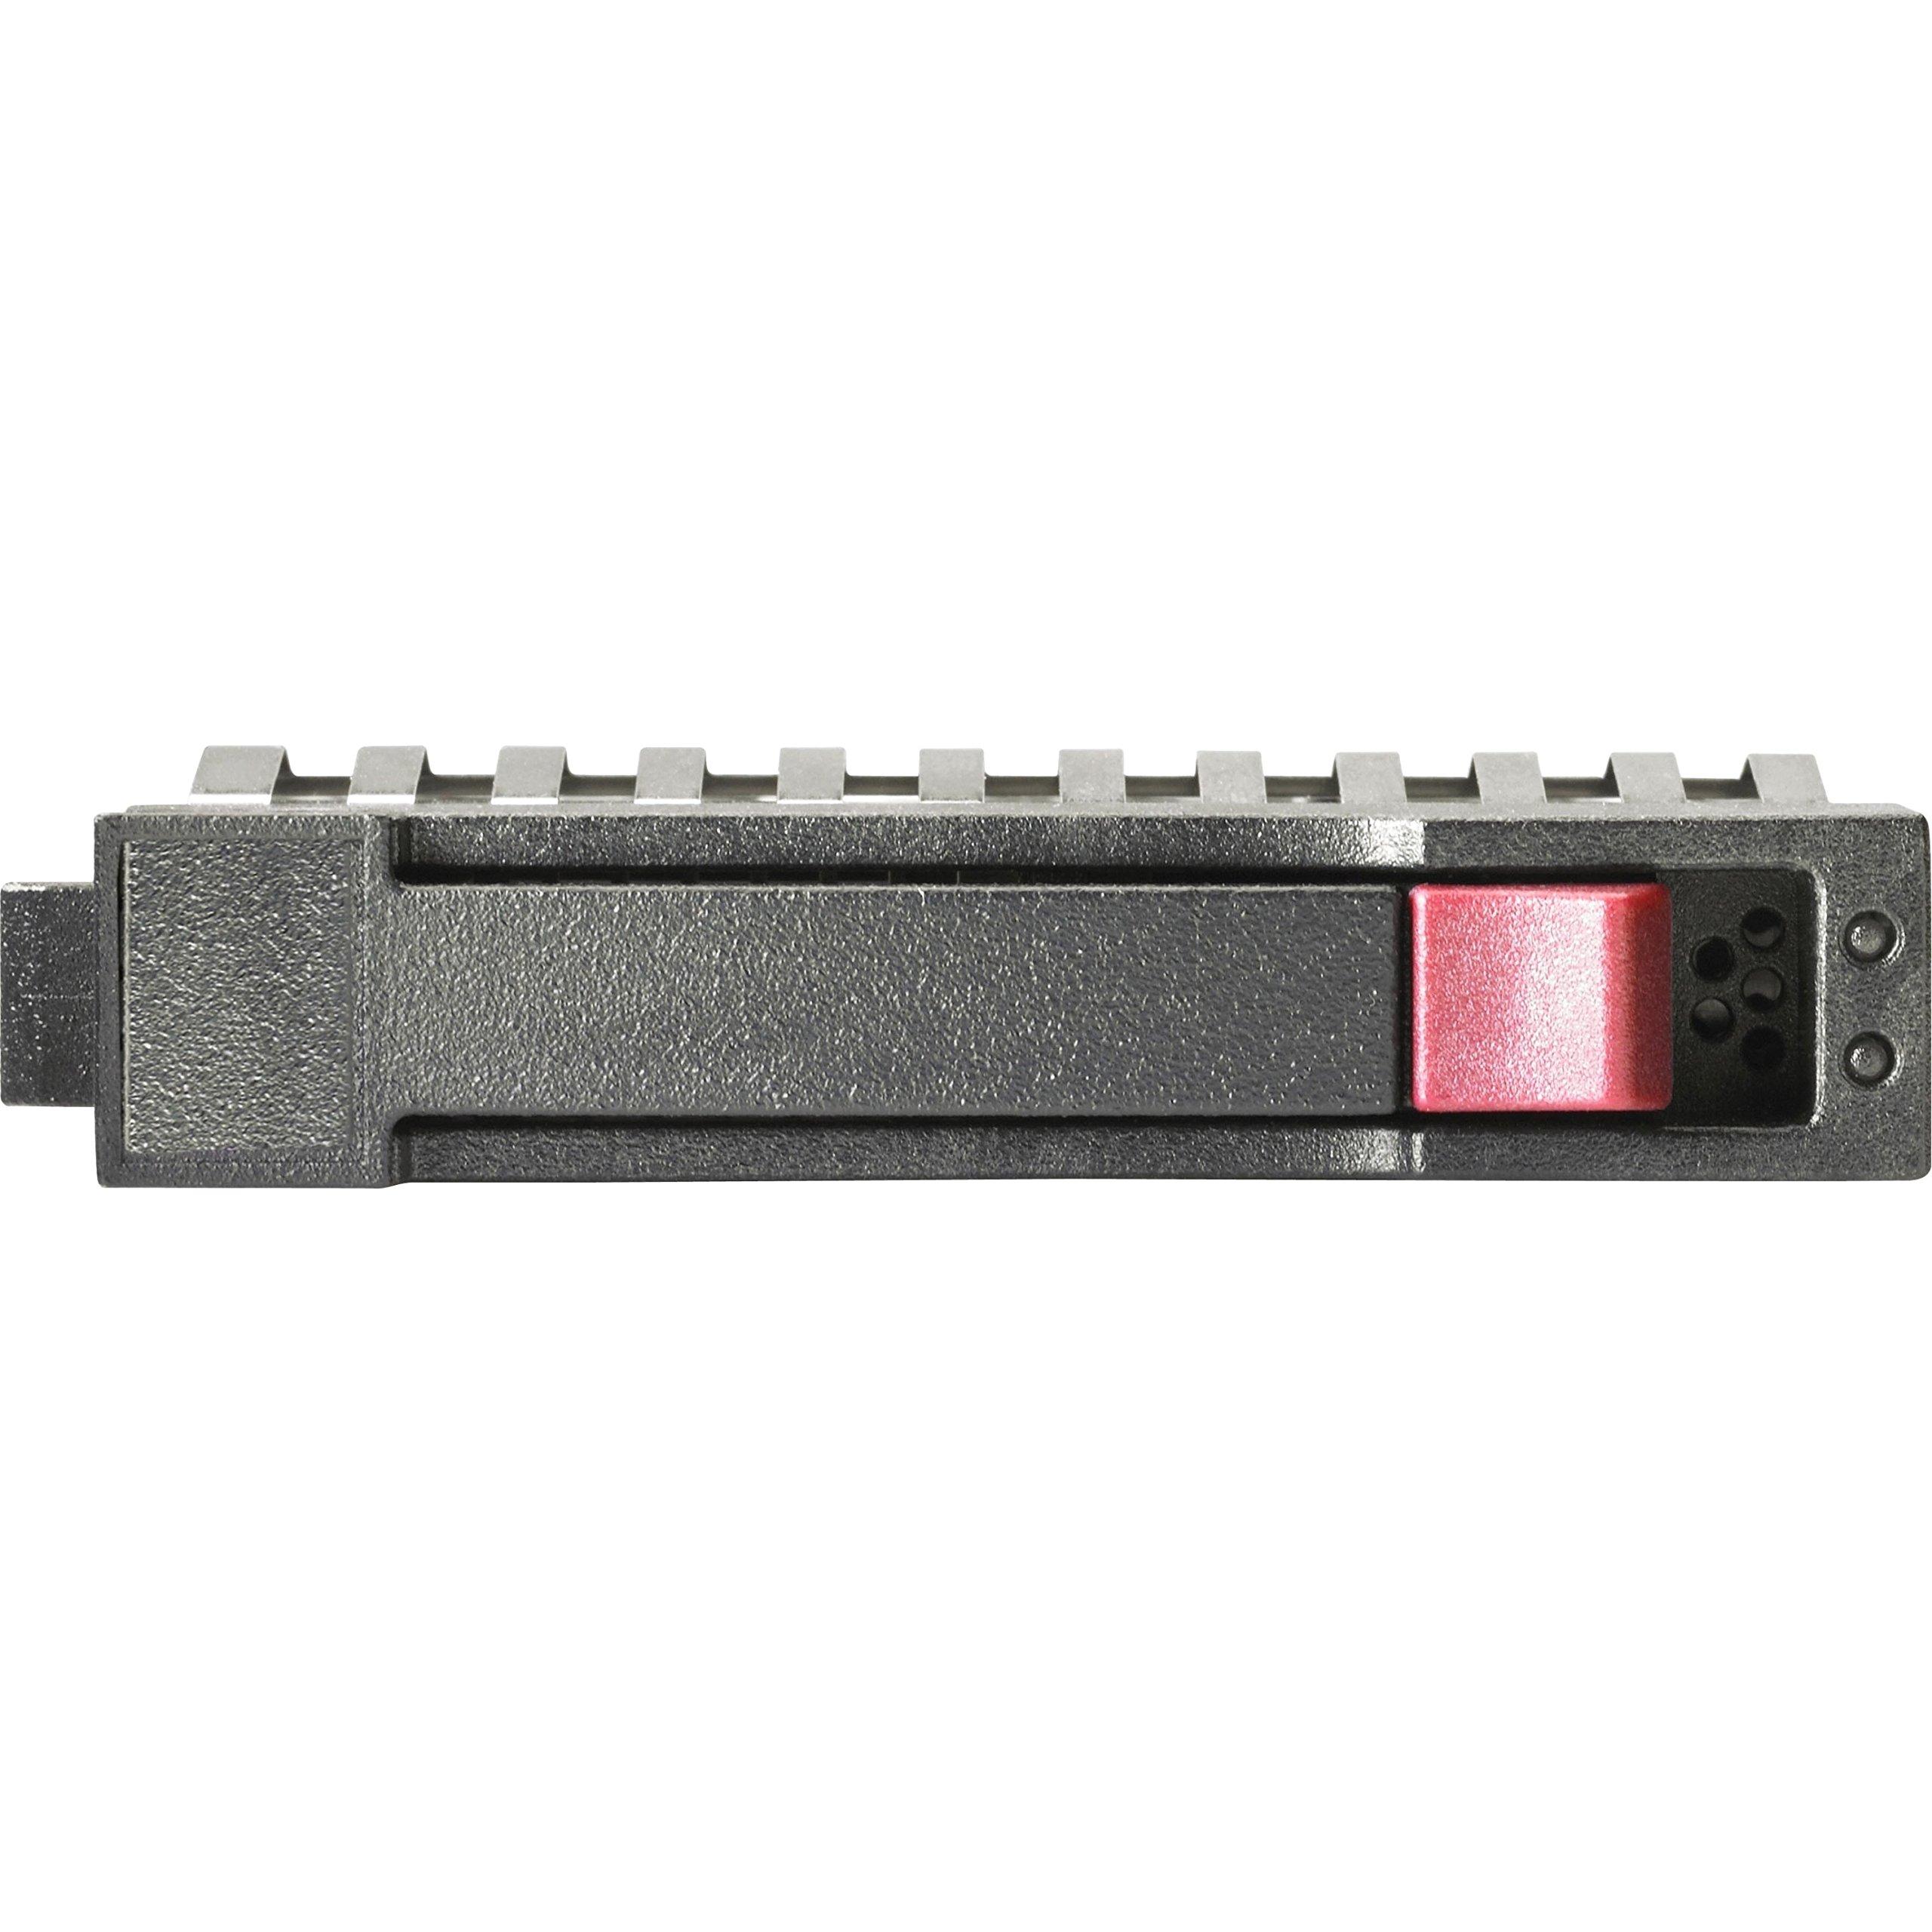 SSD 800GB SATA HP HP 800GB 3.5 3.5 Inches 764945 B21